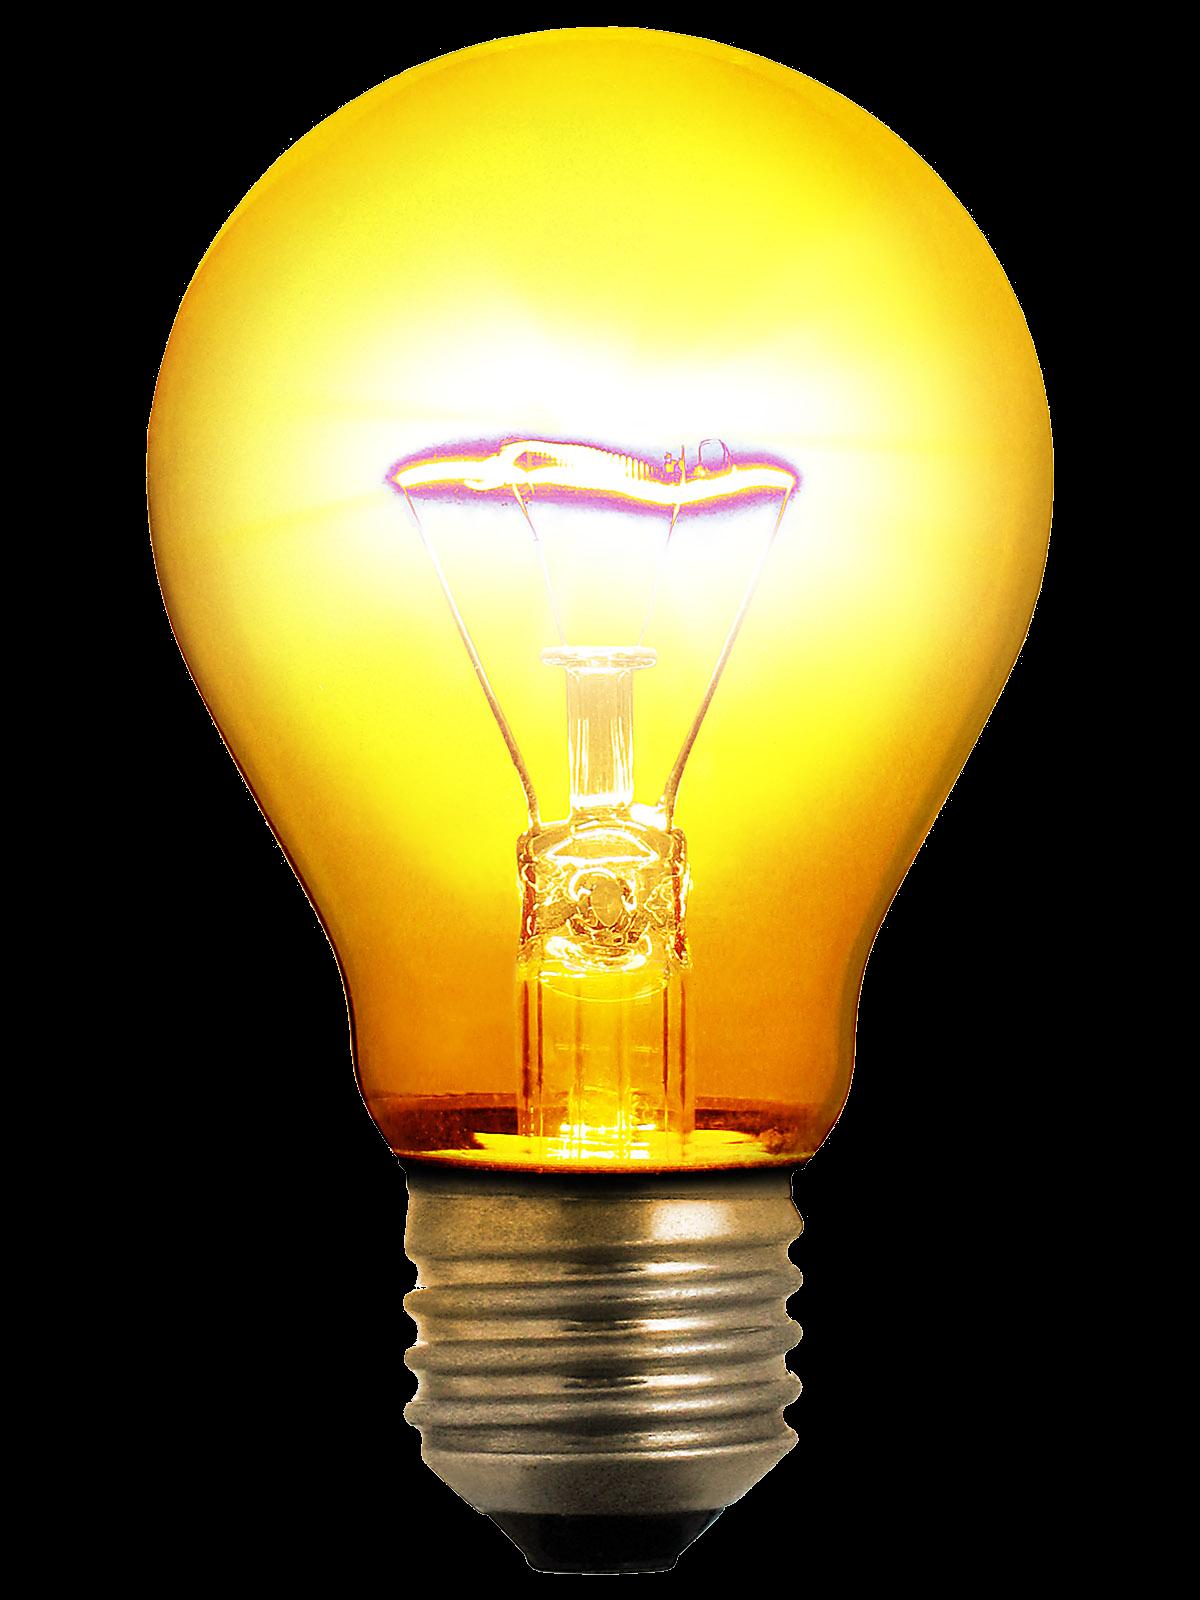 Lamp clipart light globe. Bulb png transparent free